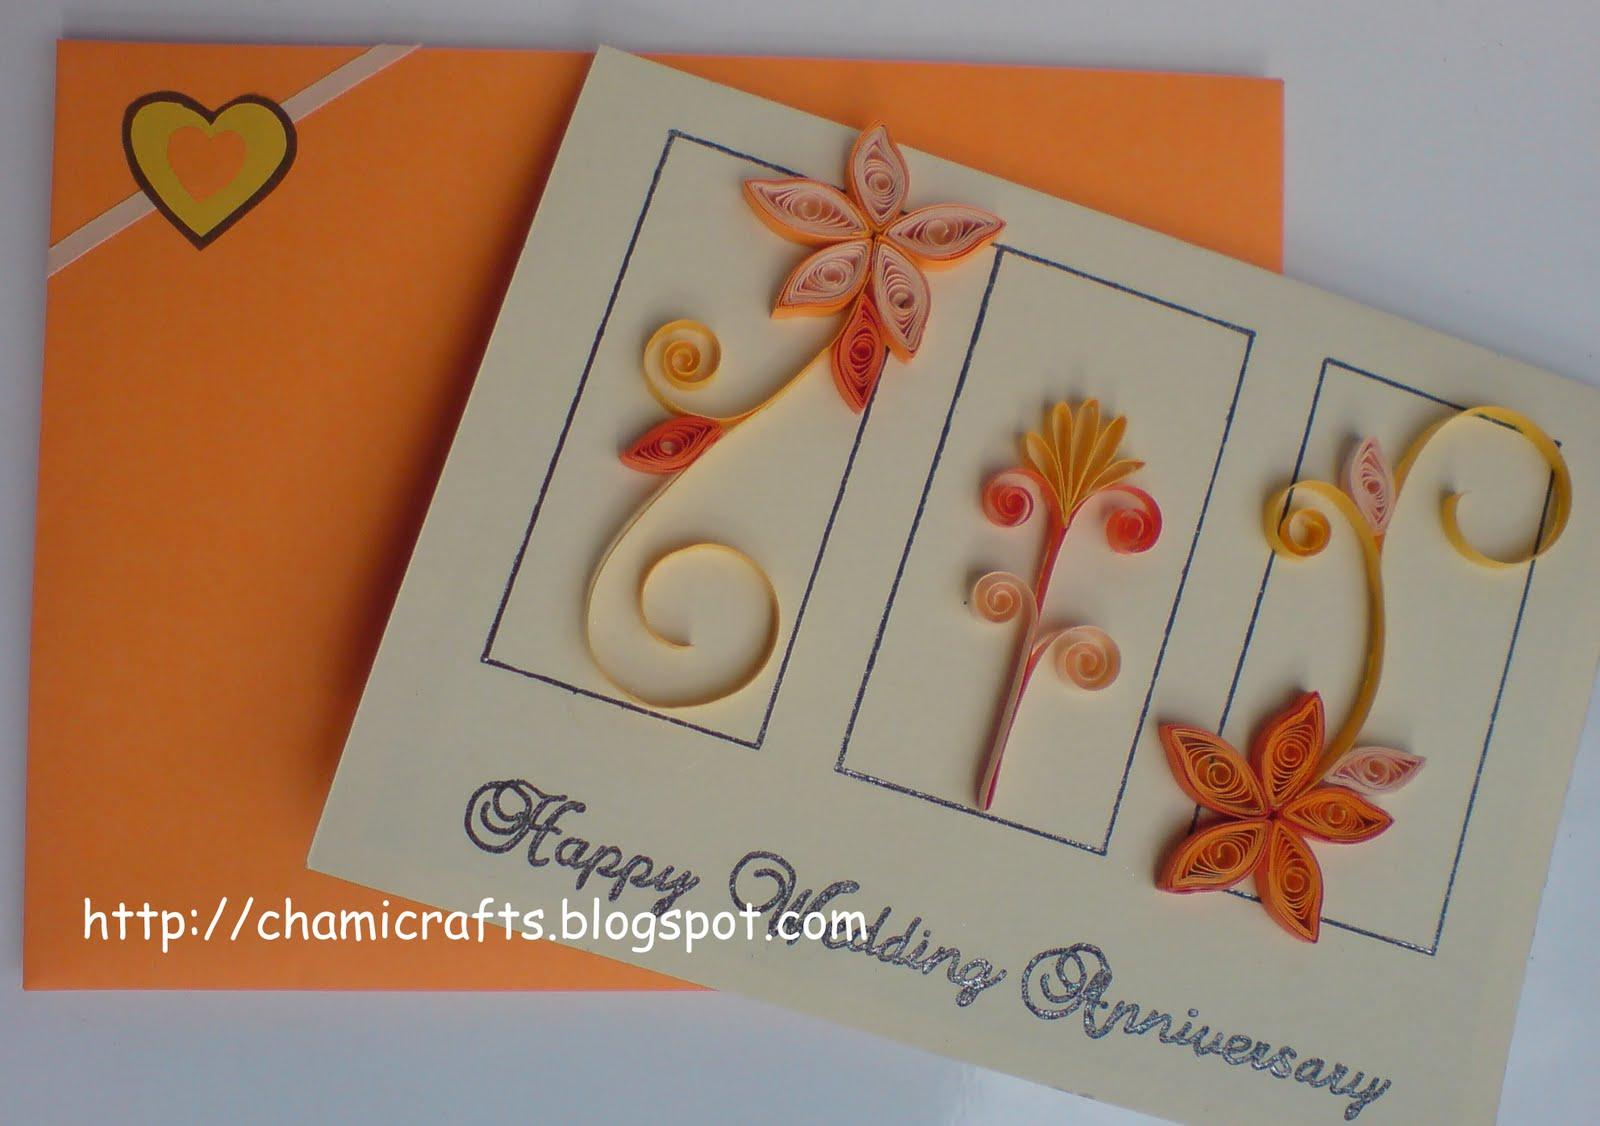 Chami Crafts - Handmade Greeting Cards: Wedding ...